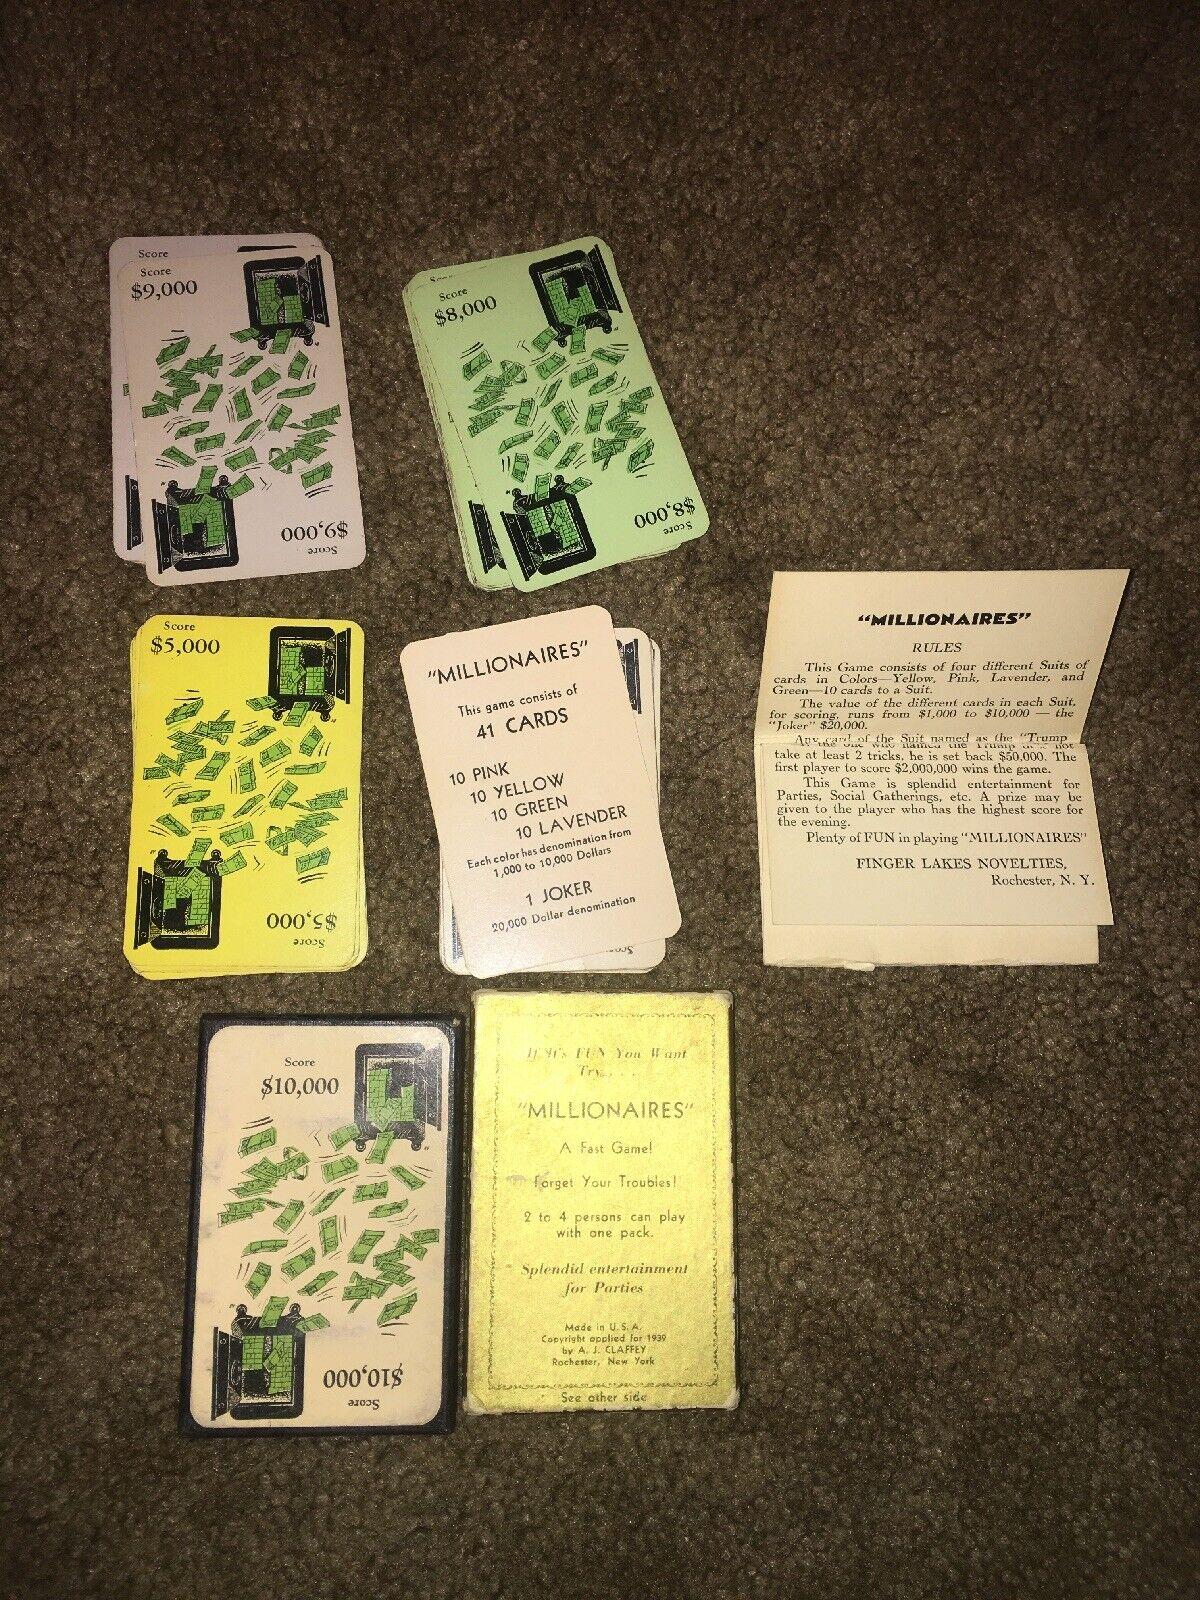 Finger Lakes Novelcravates Millionaires Vintage voitured Game  Rochester NY  magasin d'usine de sortie